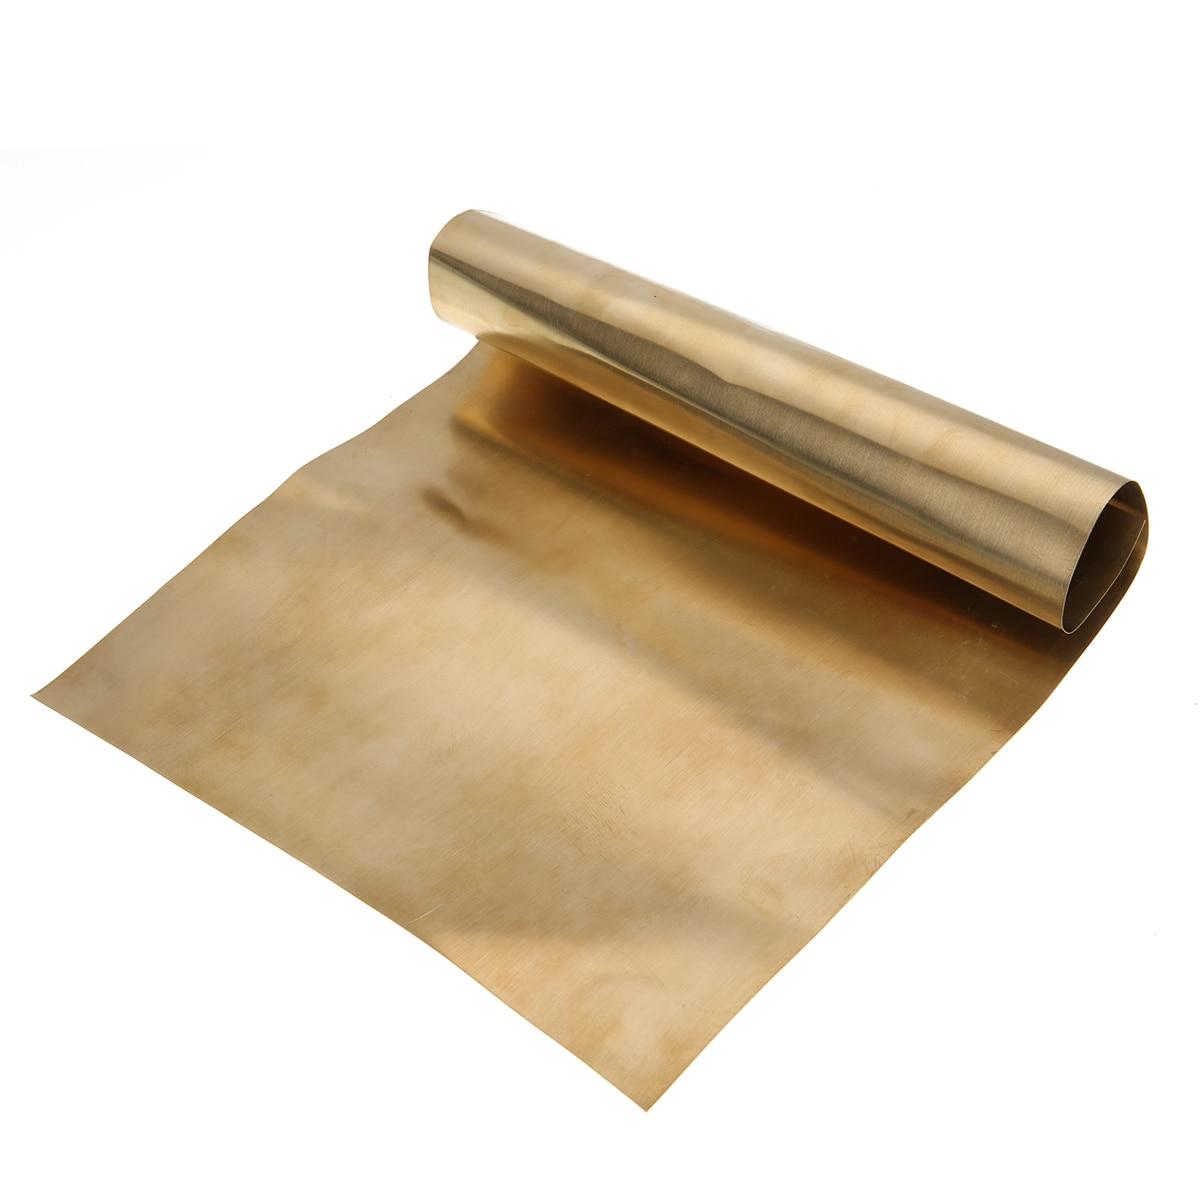 Neue 1pc Messing Blatt Messing Metall Dünne Blatt Folie Platte Shim mit Gute Bearbeitbarkeit Für Metallbearbeitung 0,2mm x 200mm x 300mm